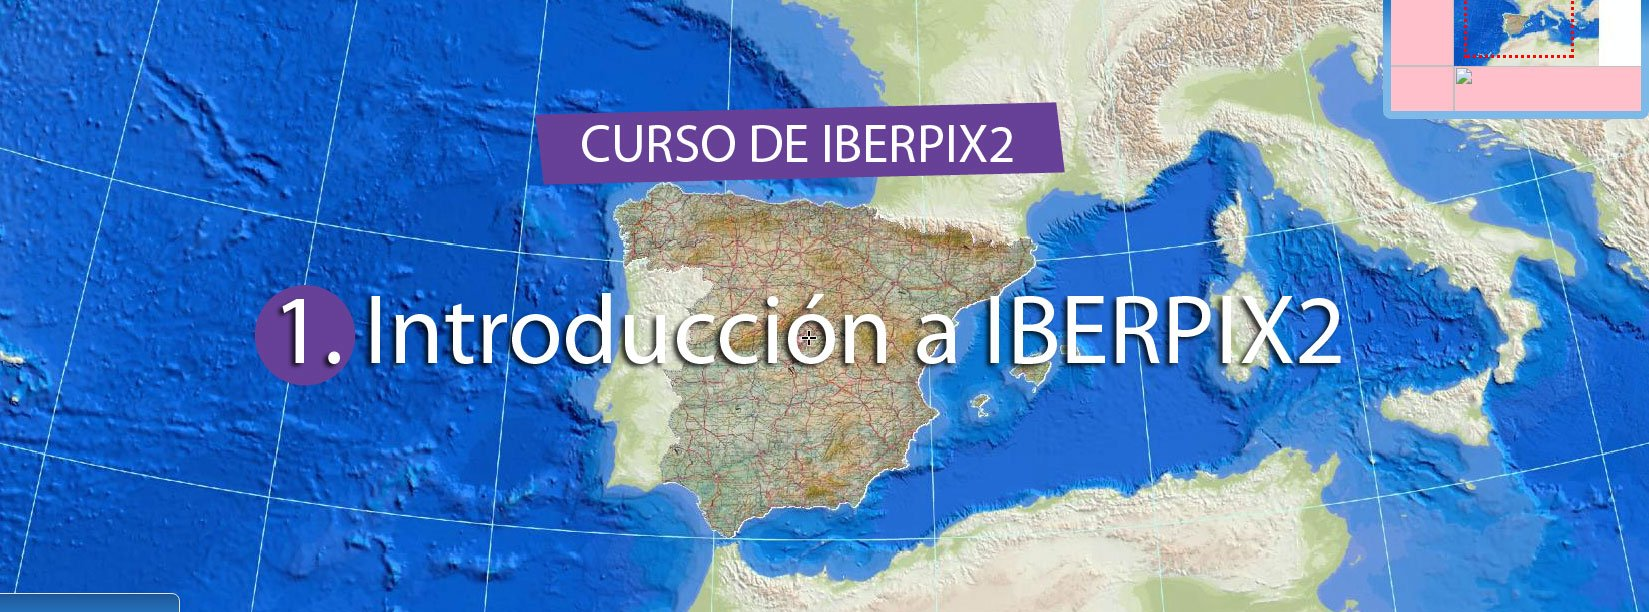 Curso de IBERPIX2 – Cap.01 Introducción a IBERPIX2